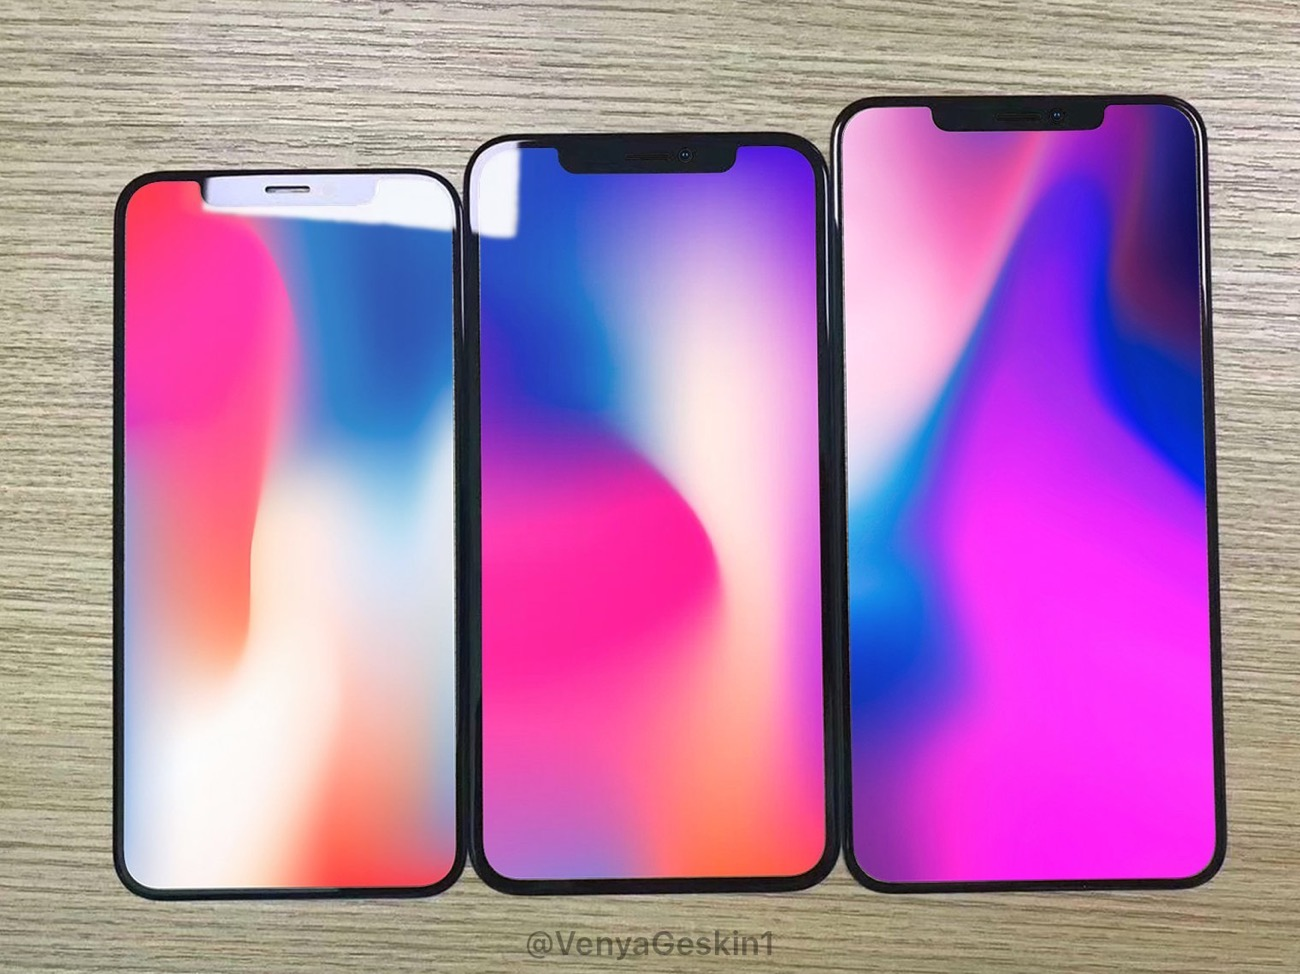 IPhone 2018 pannello vetro rumor